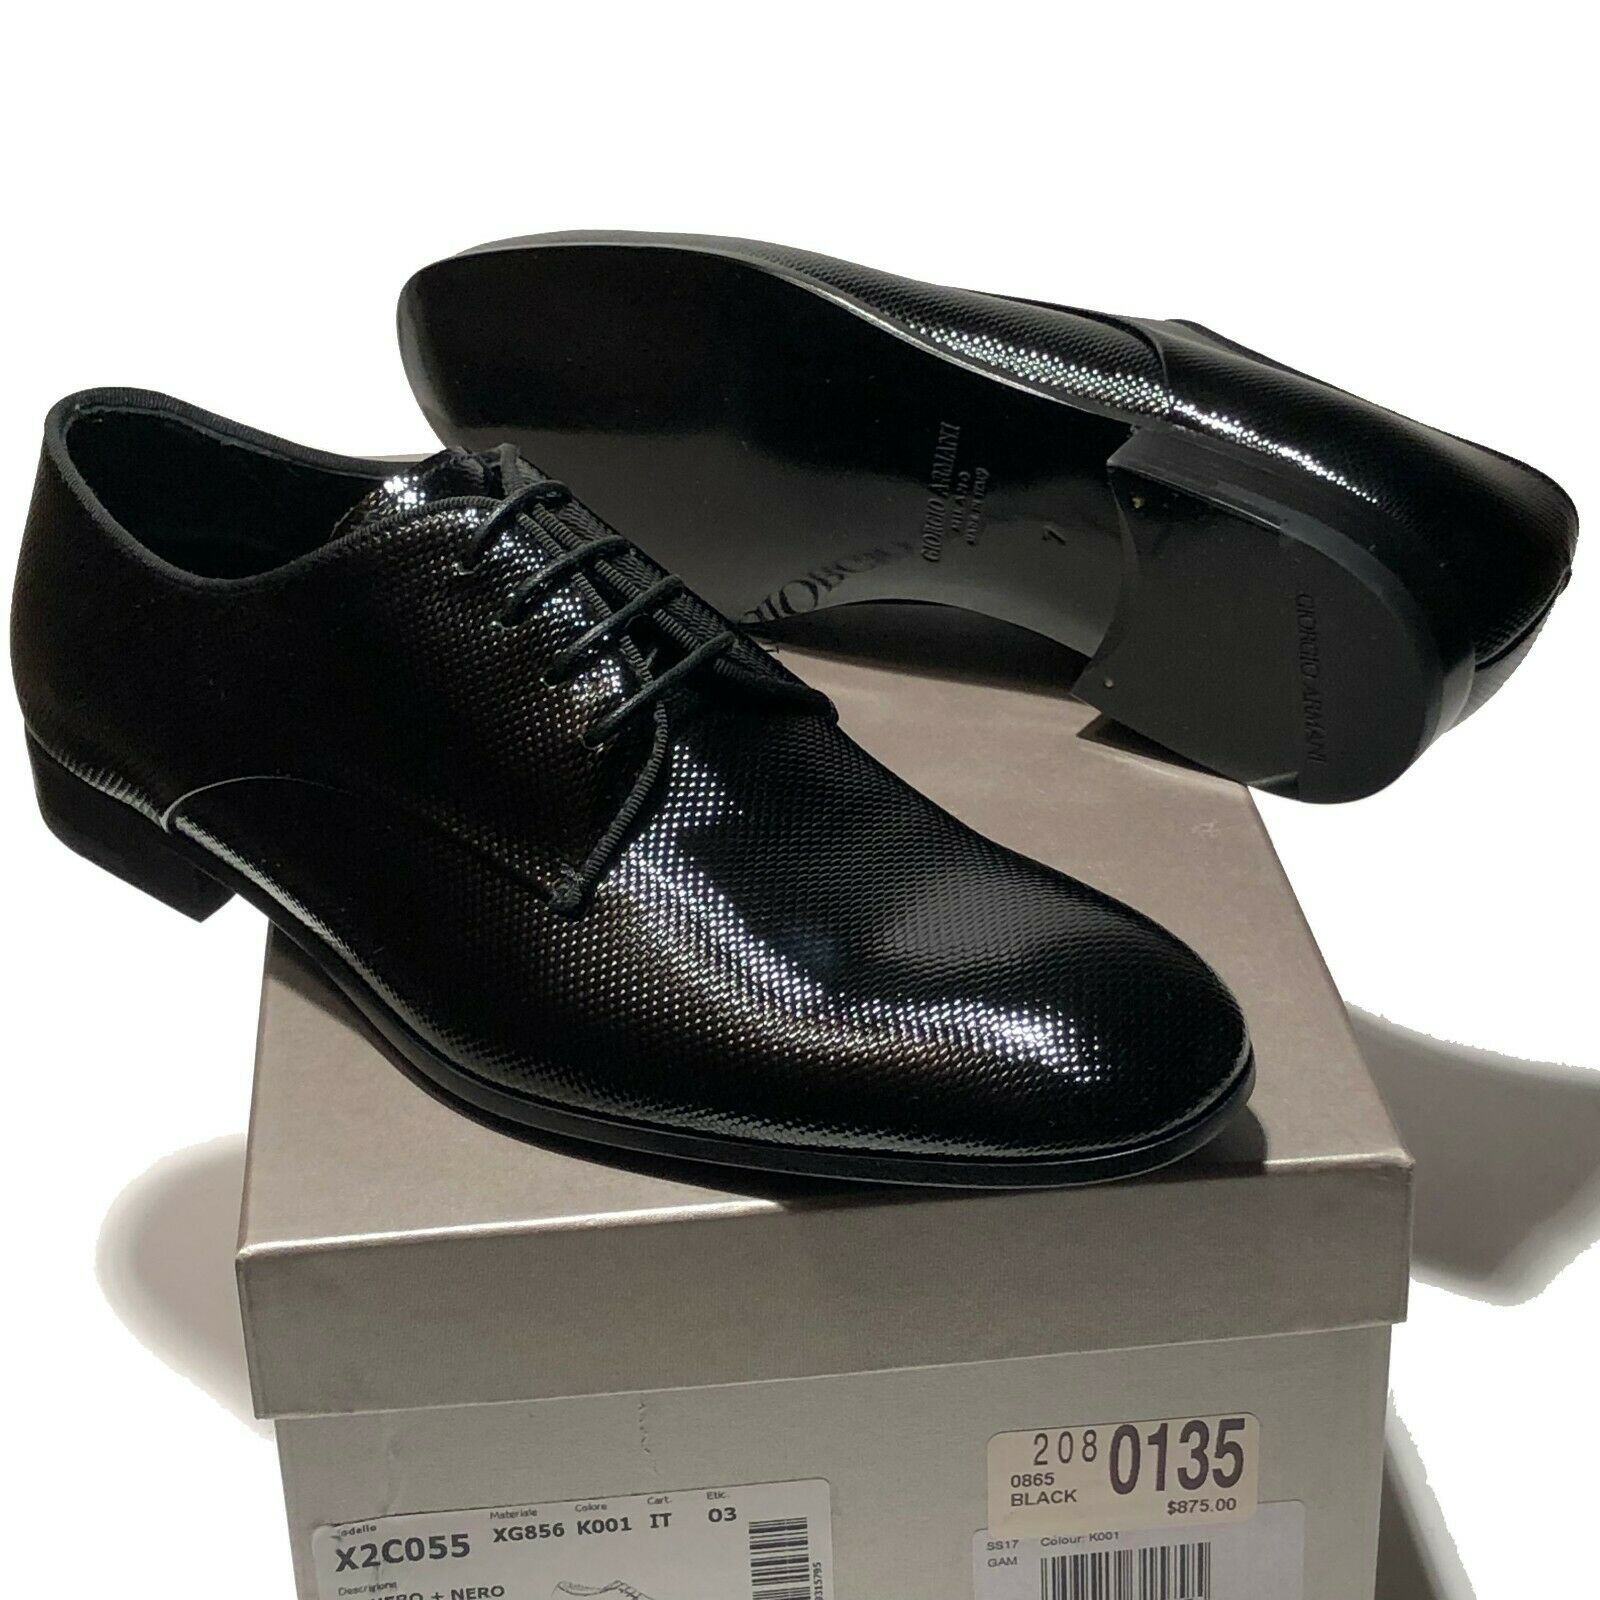 punto vendita  875 Armani Pebbled Patent Leather Leather Leather Formal Dress Wedding Oxford 10.5 Uomo Tuxedo  prezzi equi